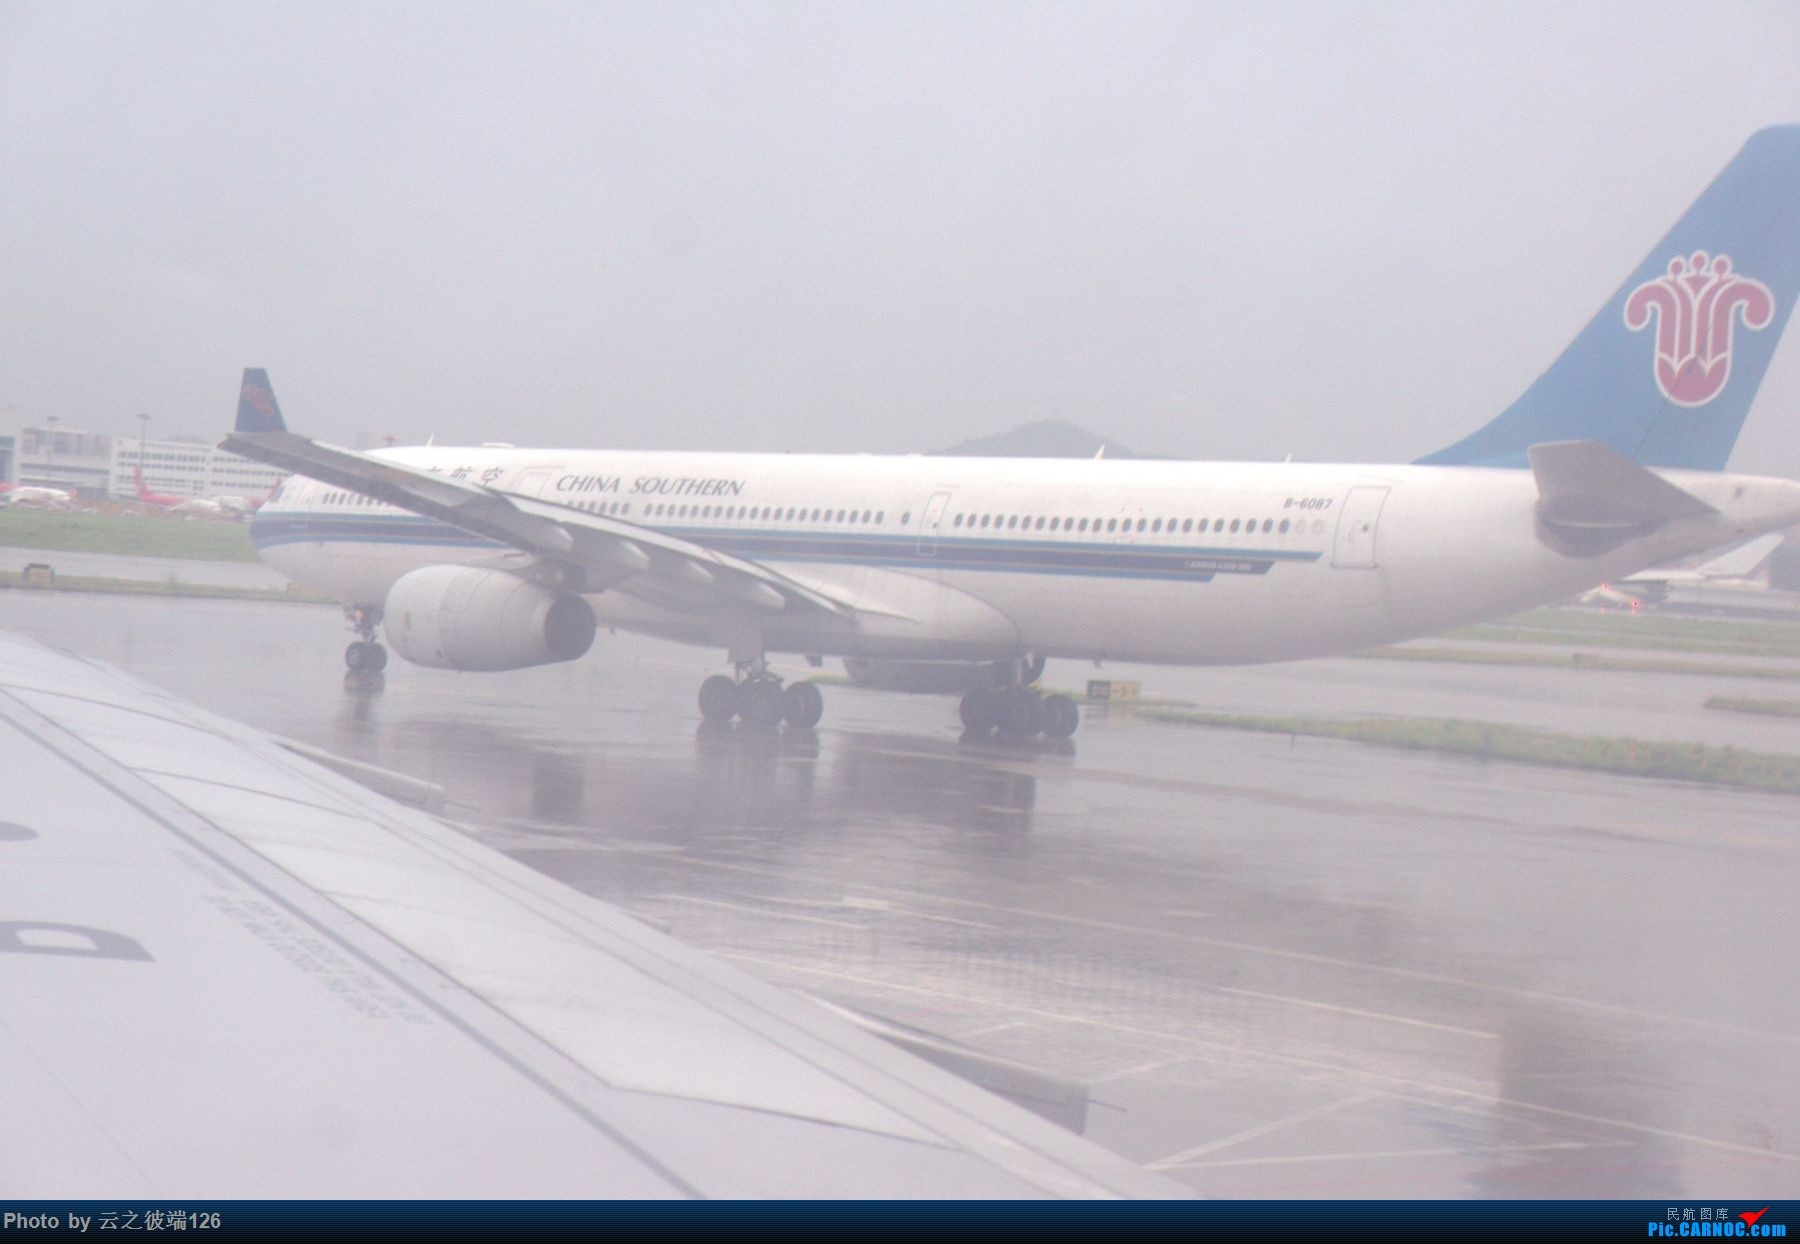 Re:[原创]迟到两年的游记 -----------NKG-SZX-NKG ZH+白菜航------ AIRBUS A330-300 B-6087 中国深圳宝安国际机场